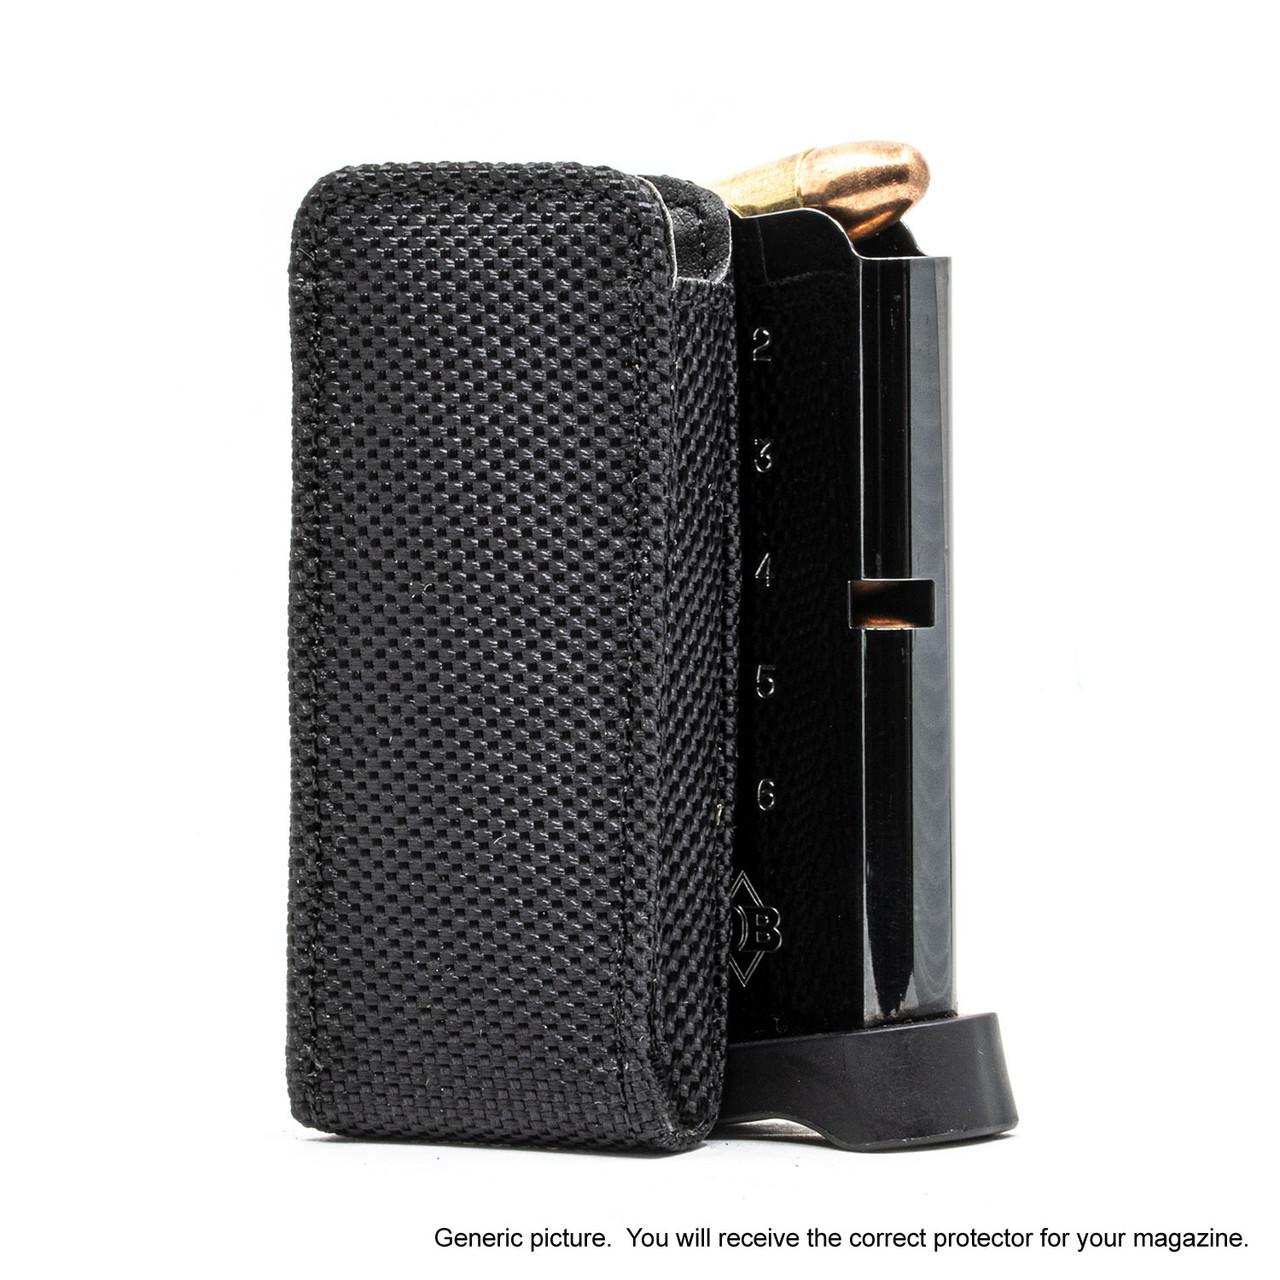 Beretta APX Carry Holsters Black Ballistic Nylon Magazine Pocket Protector